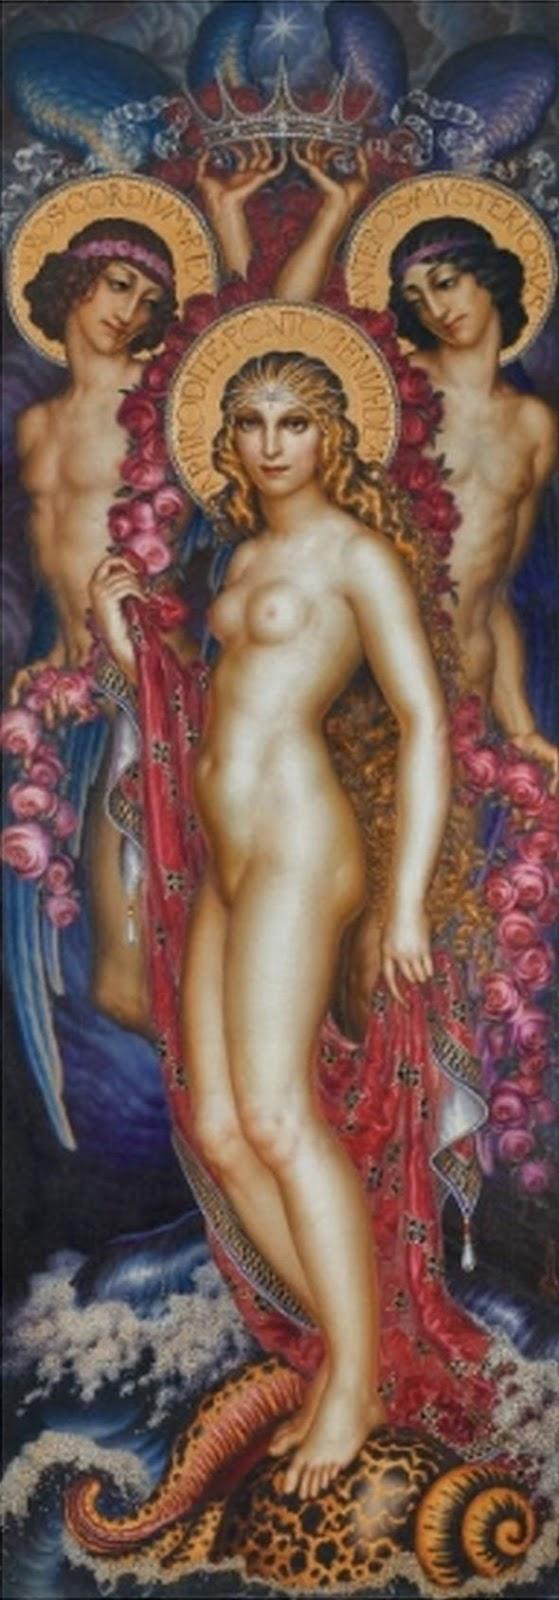 Мистический эротизм Калмакова (18).jpg